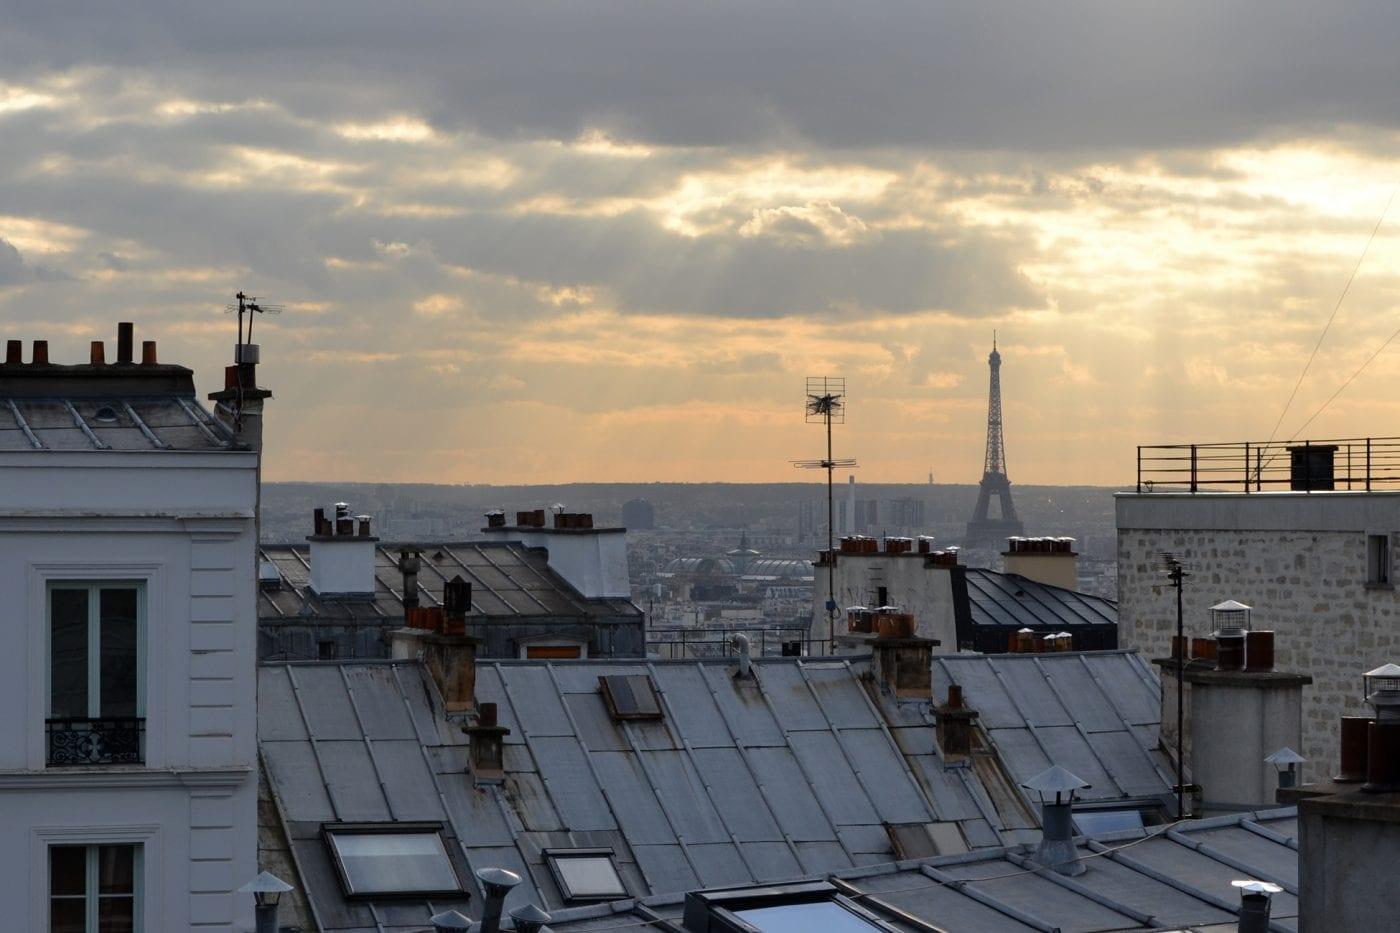 paris roof tops and sky line of paris